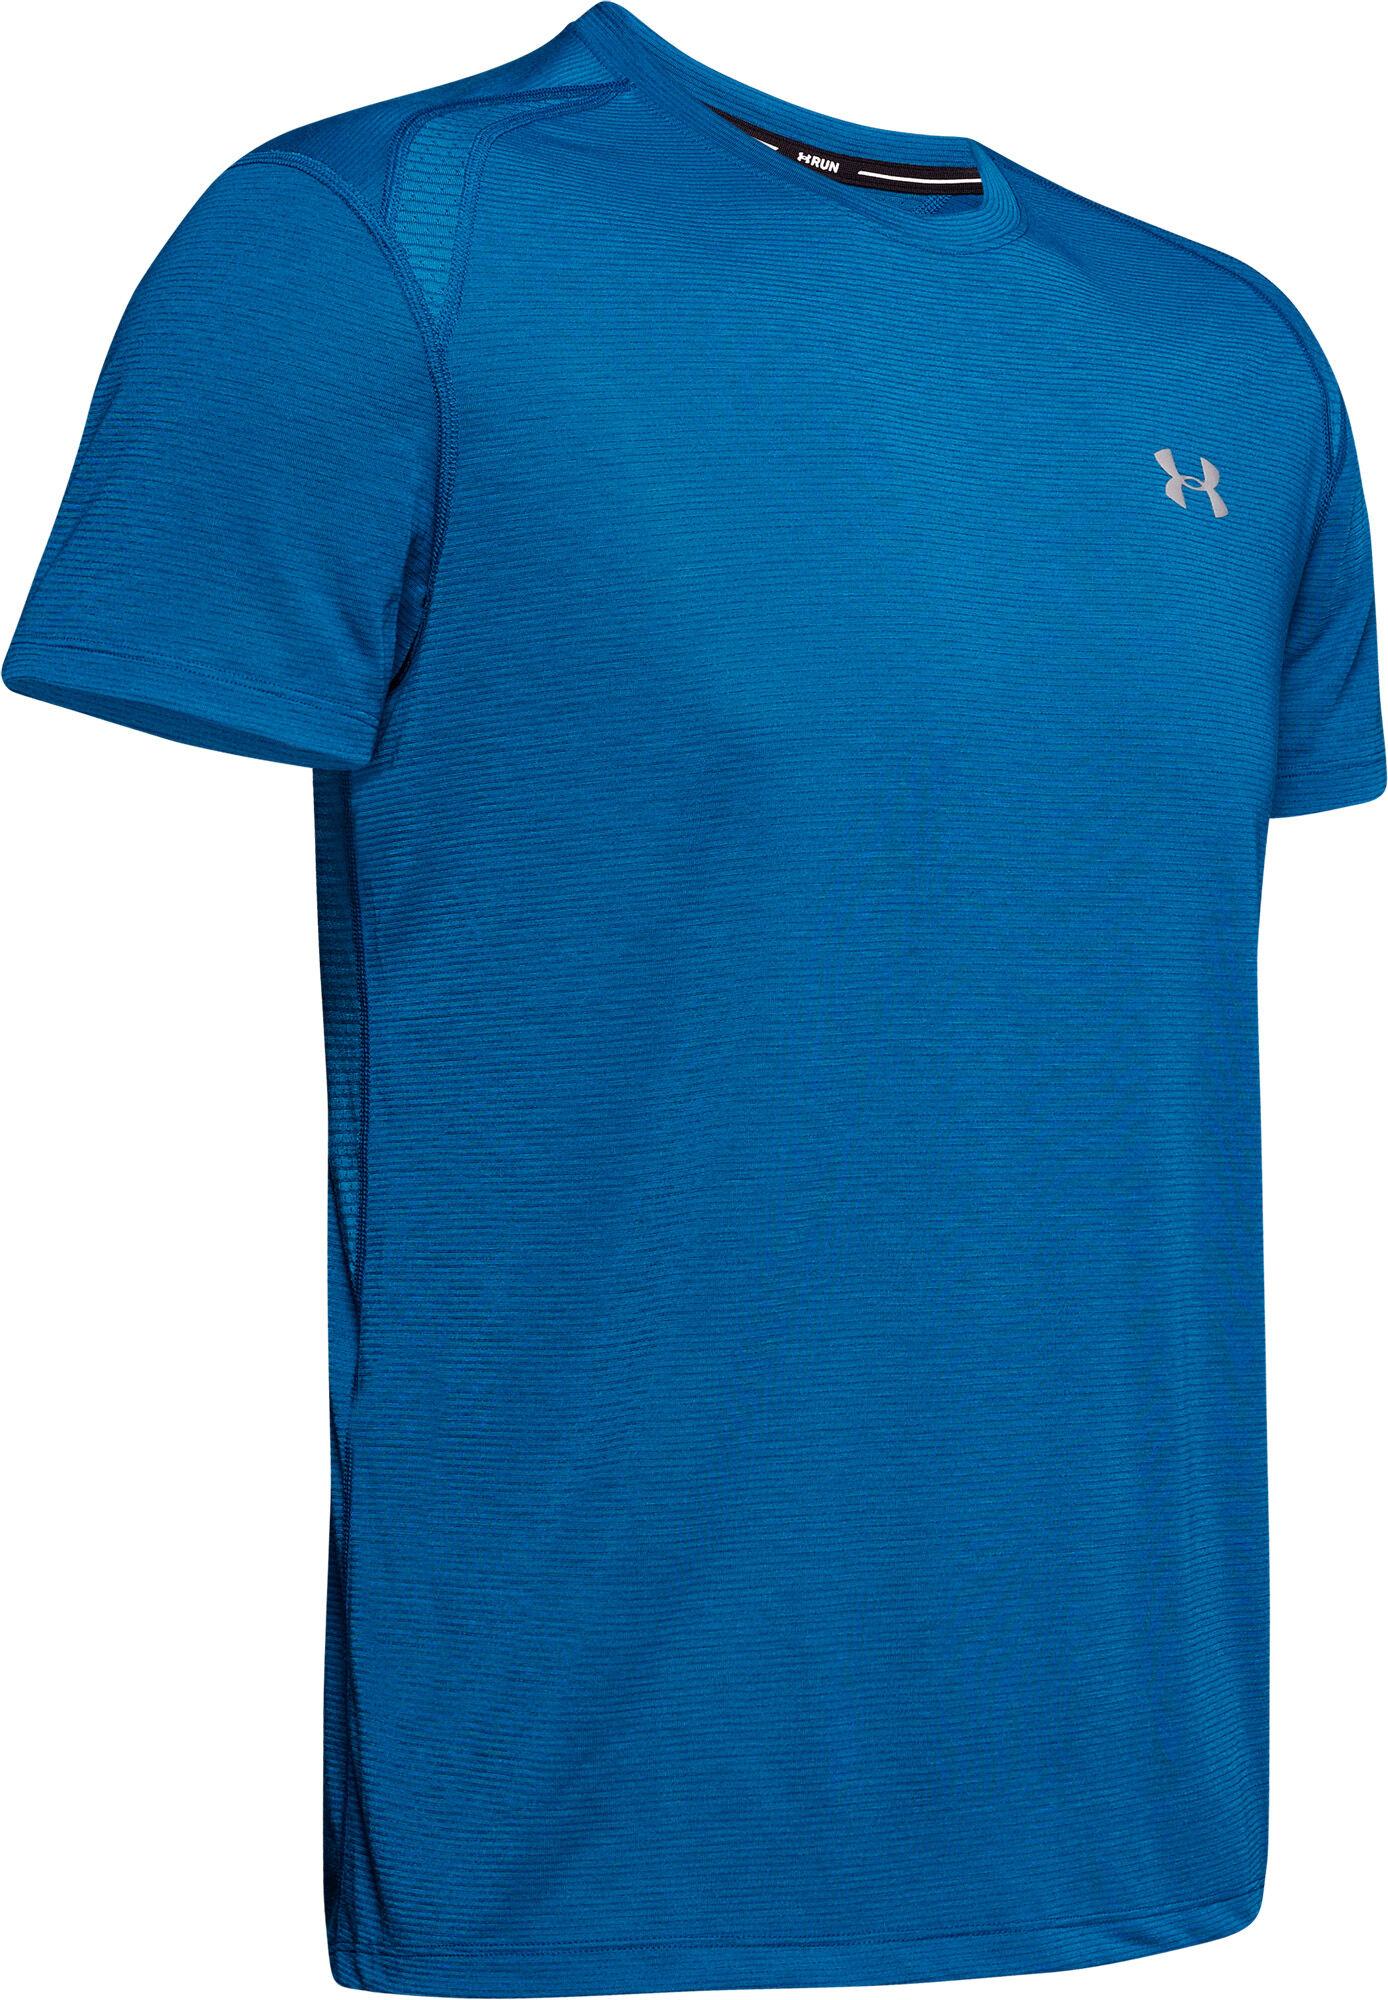 Nike Damen Dri Fit T Shirt, Damen, weiß: : Bekleidung